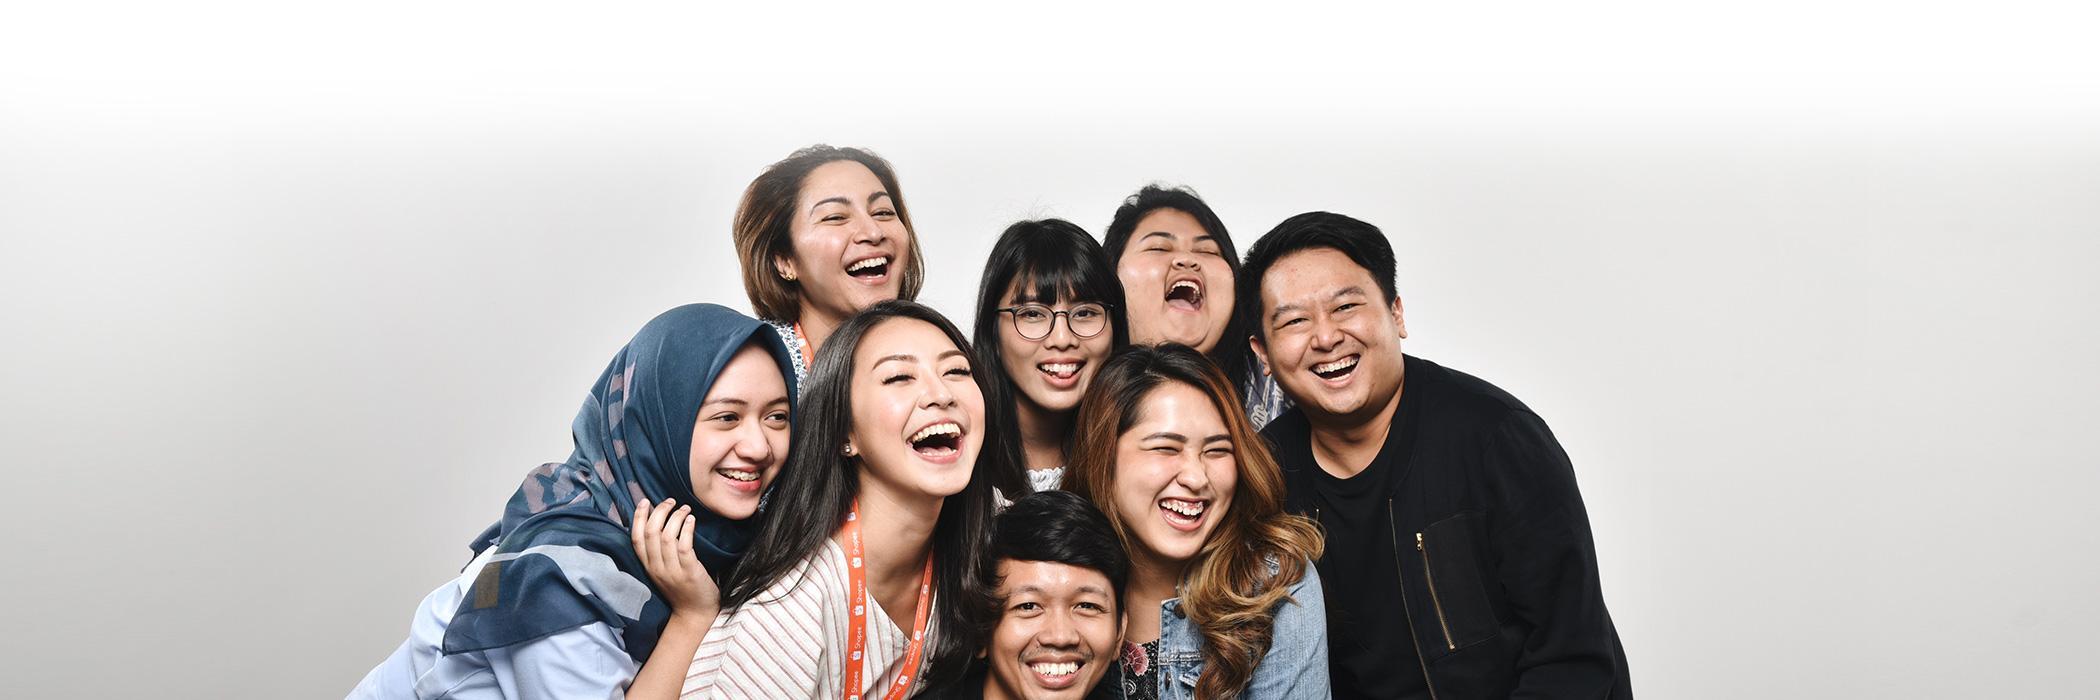 Shopee Careers - Come Make History With Us | Shopee Singapore